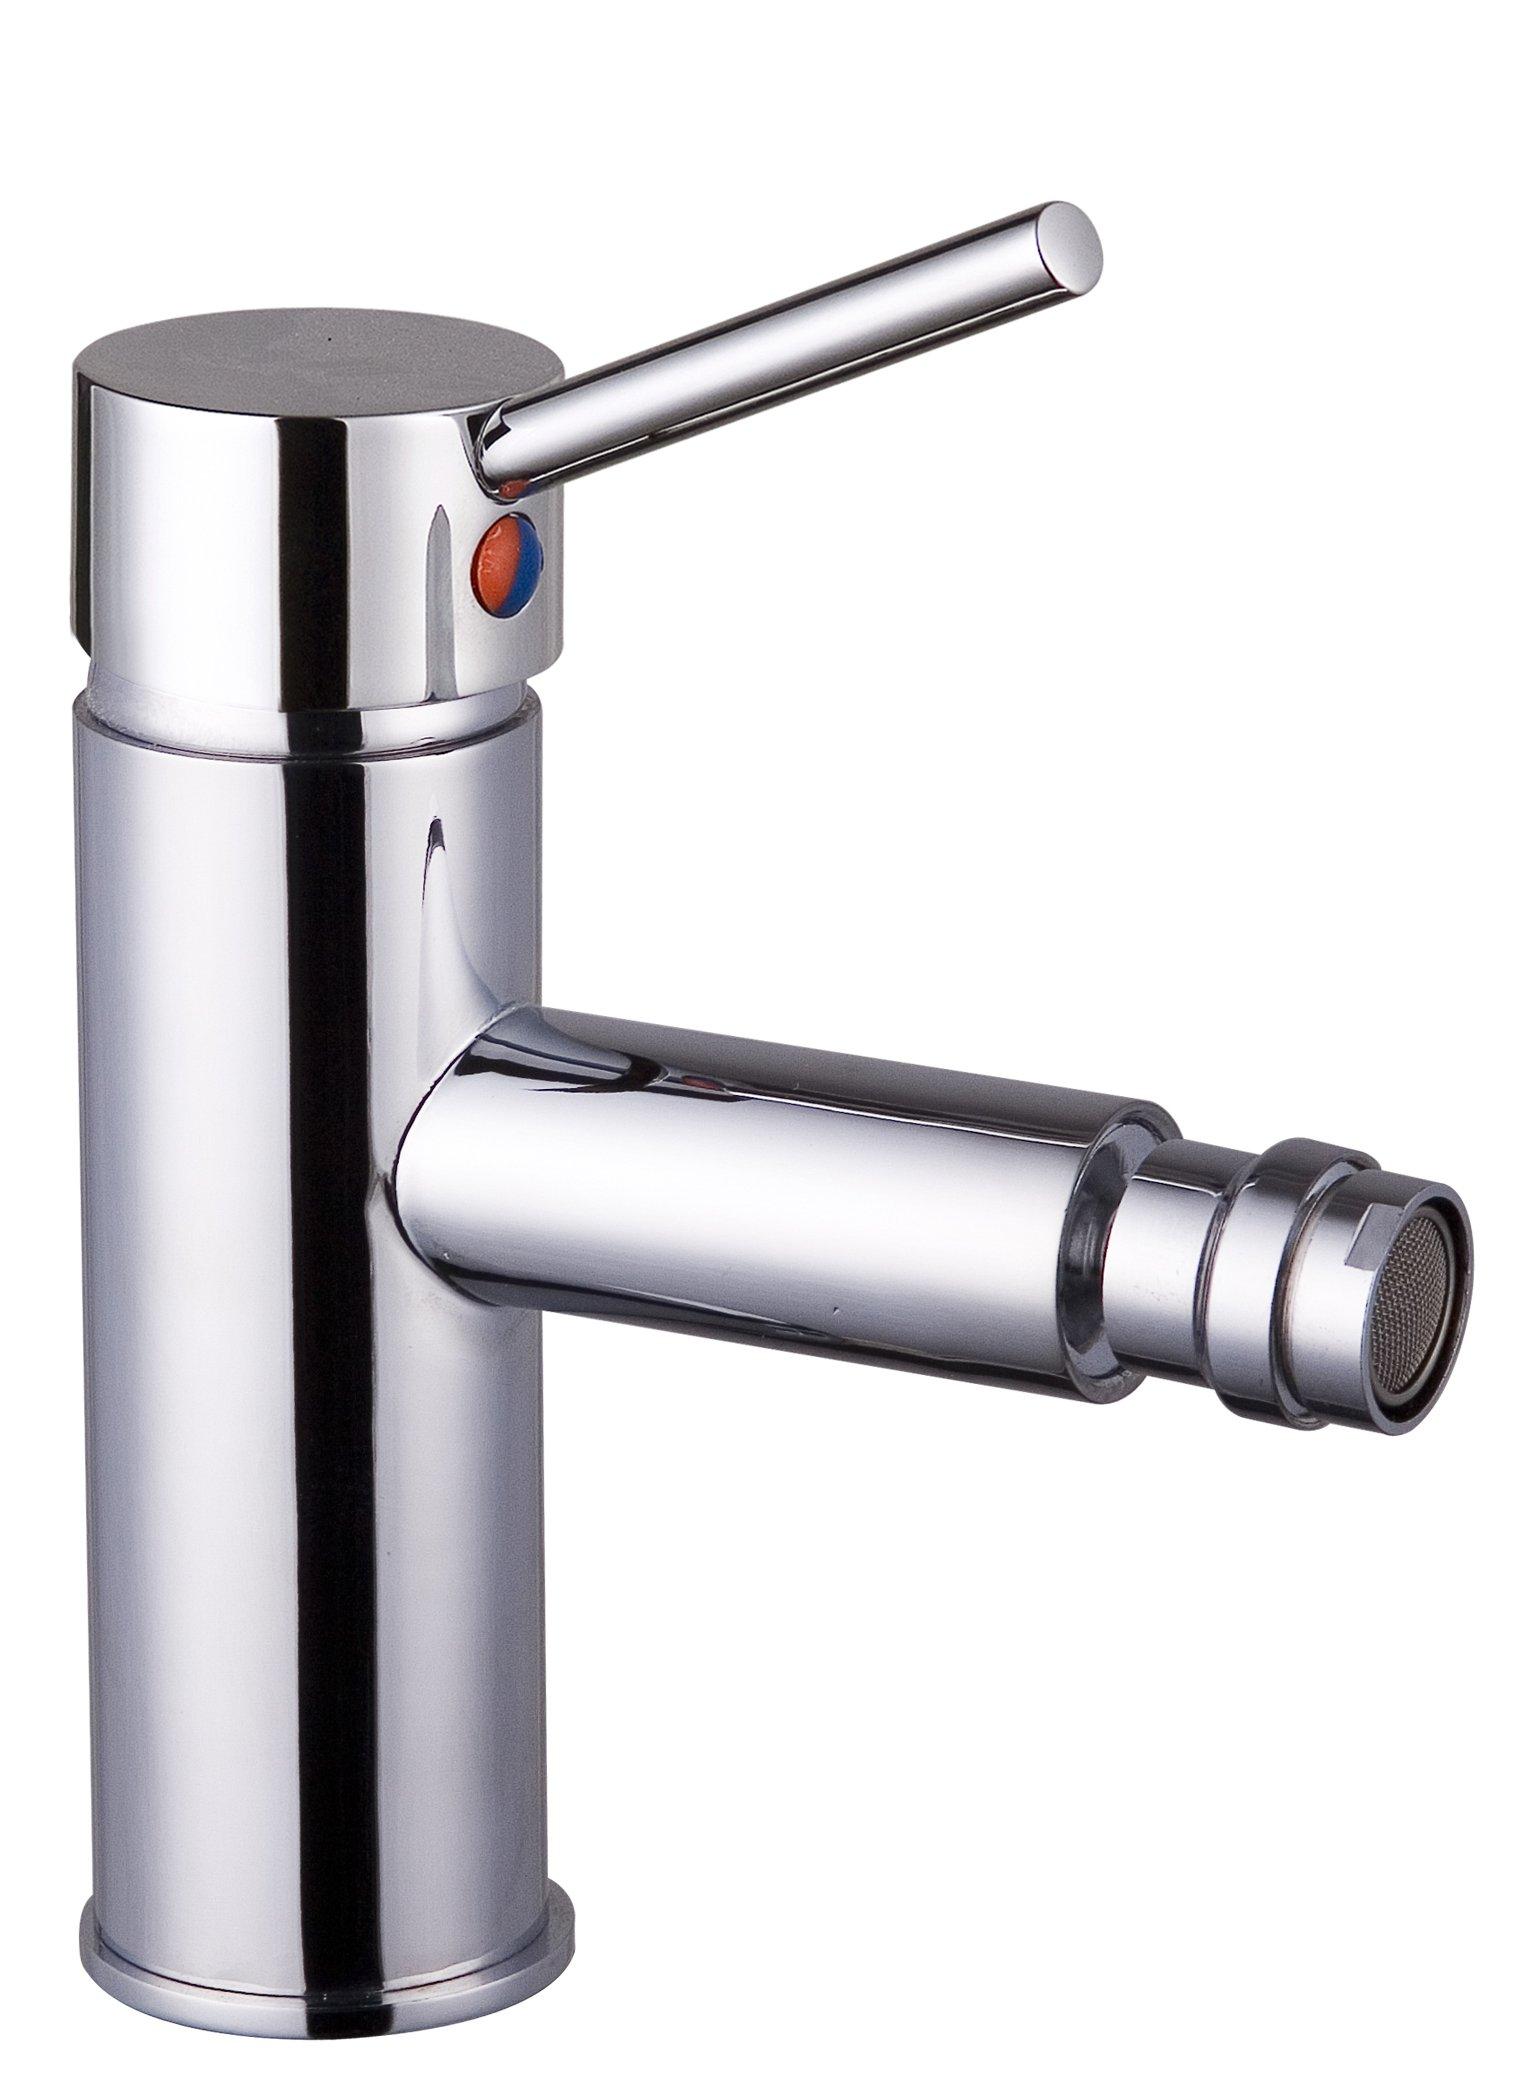 DP Bath SG-0002''Haya'' Bidet Mixer Tap - Chrome